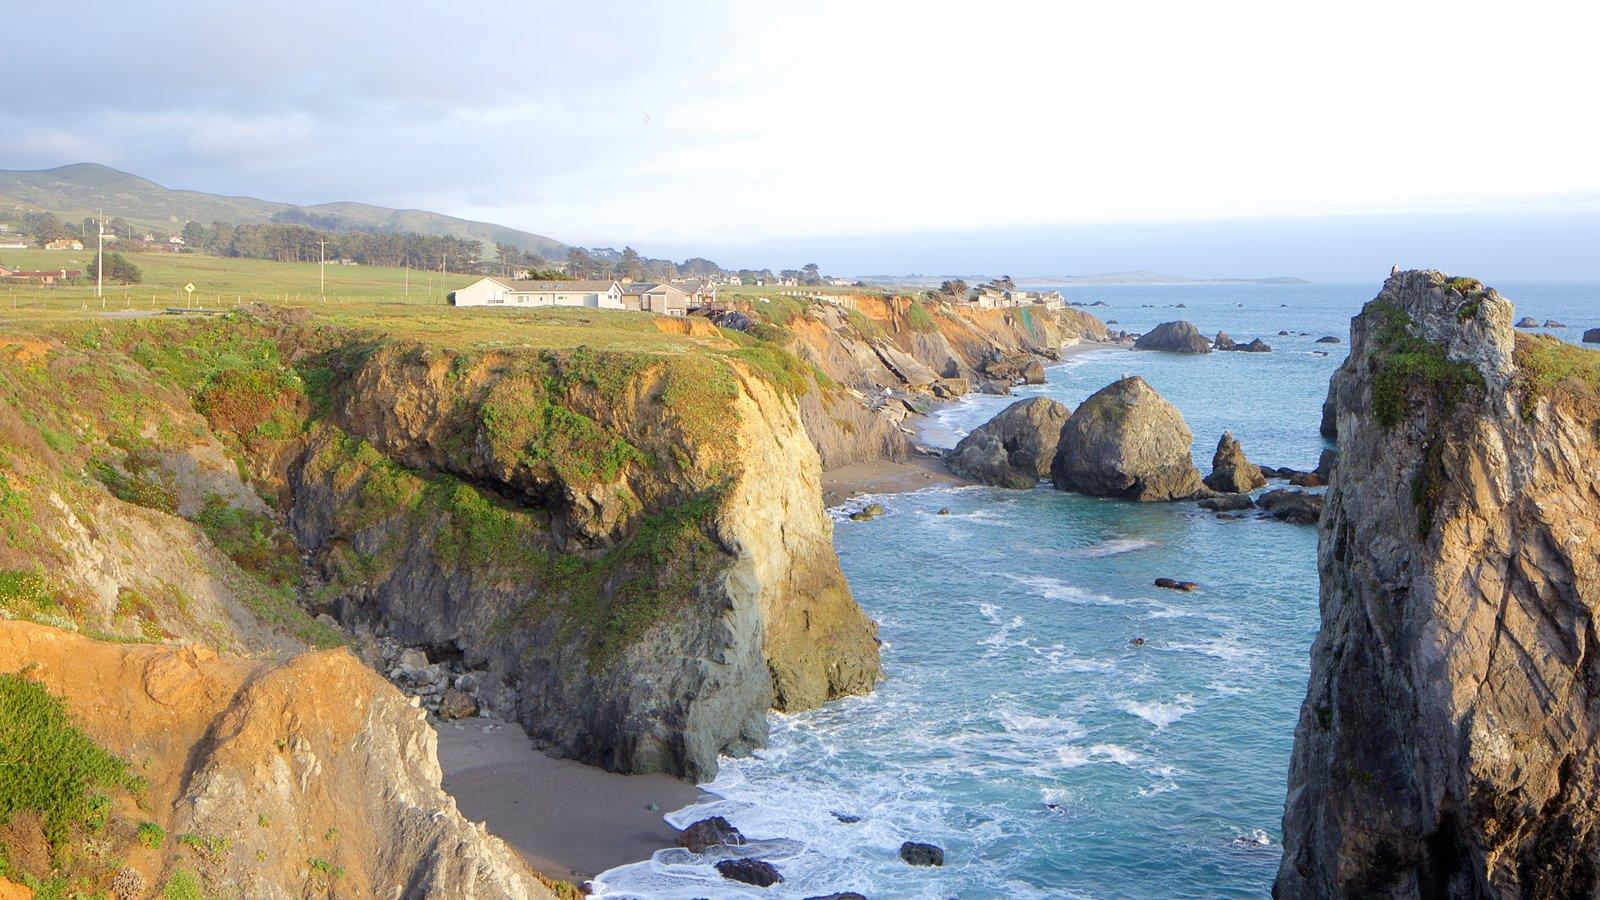 Sonoma Valley featuring tranquil scenes, rocky coastline and general coastal views